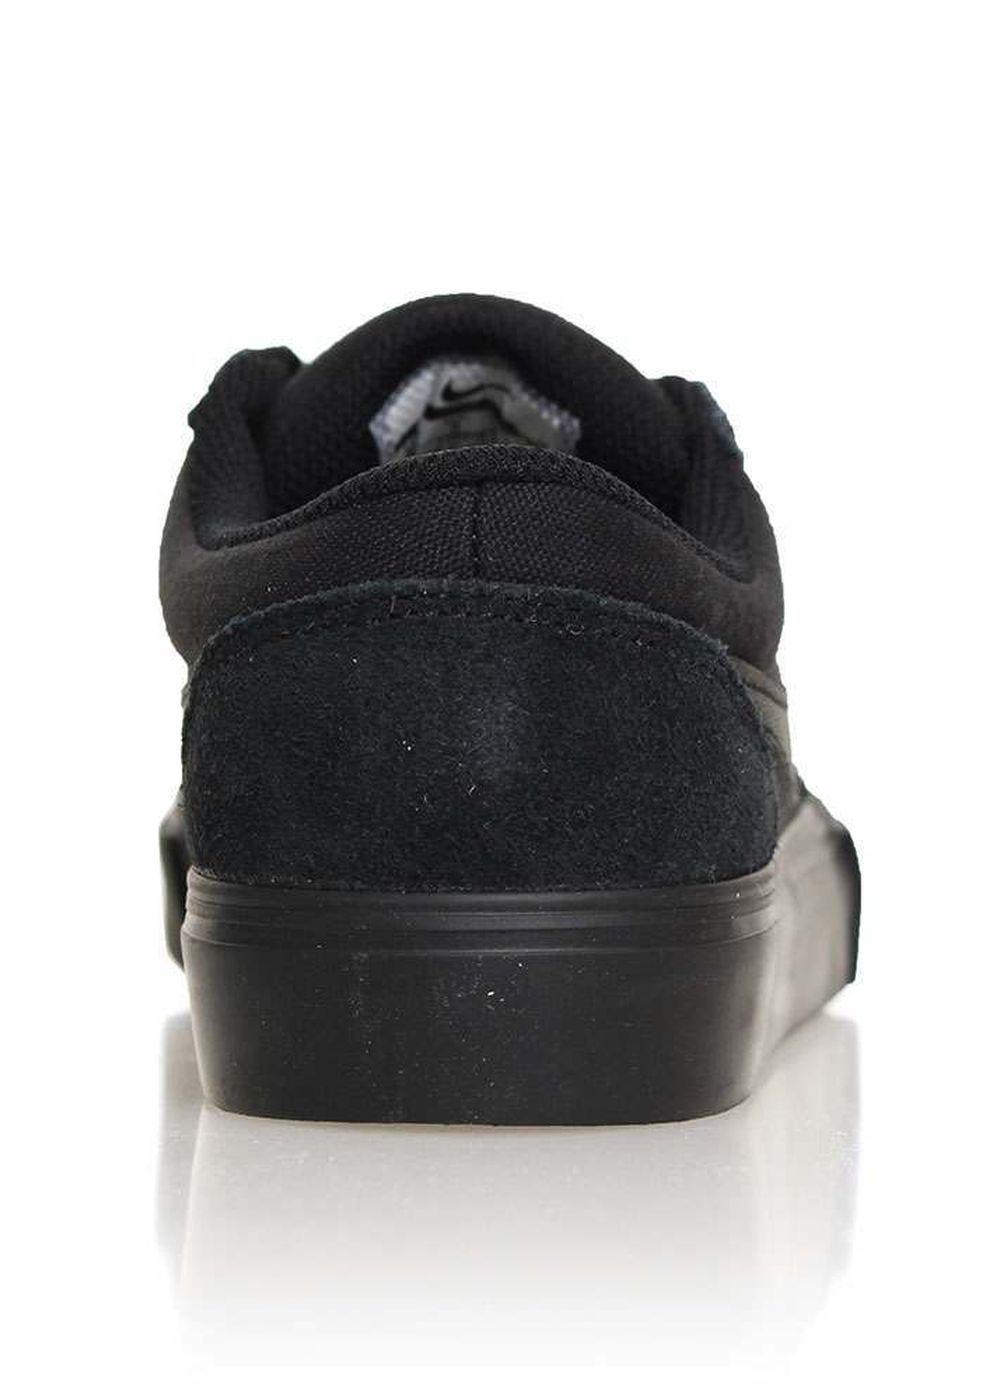 Elaborar Alfabeto A bordo  Nike SB Boys Satire II Shoes Black/Black